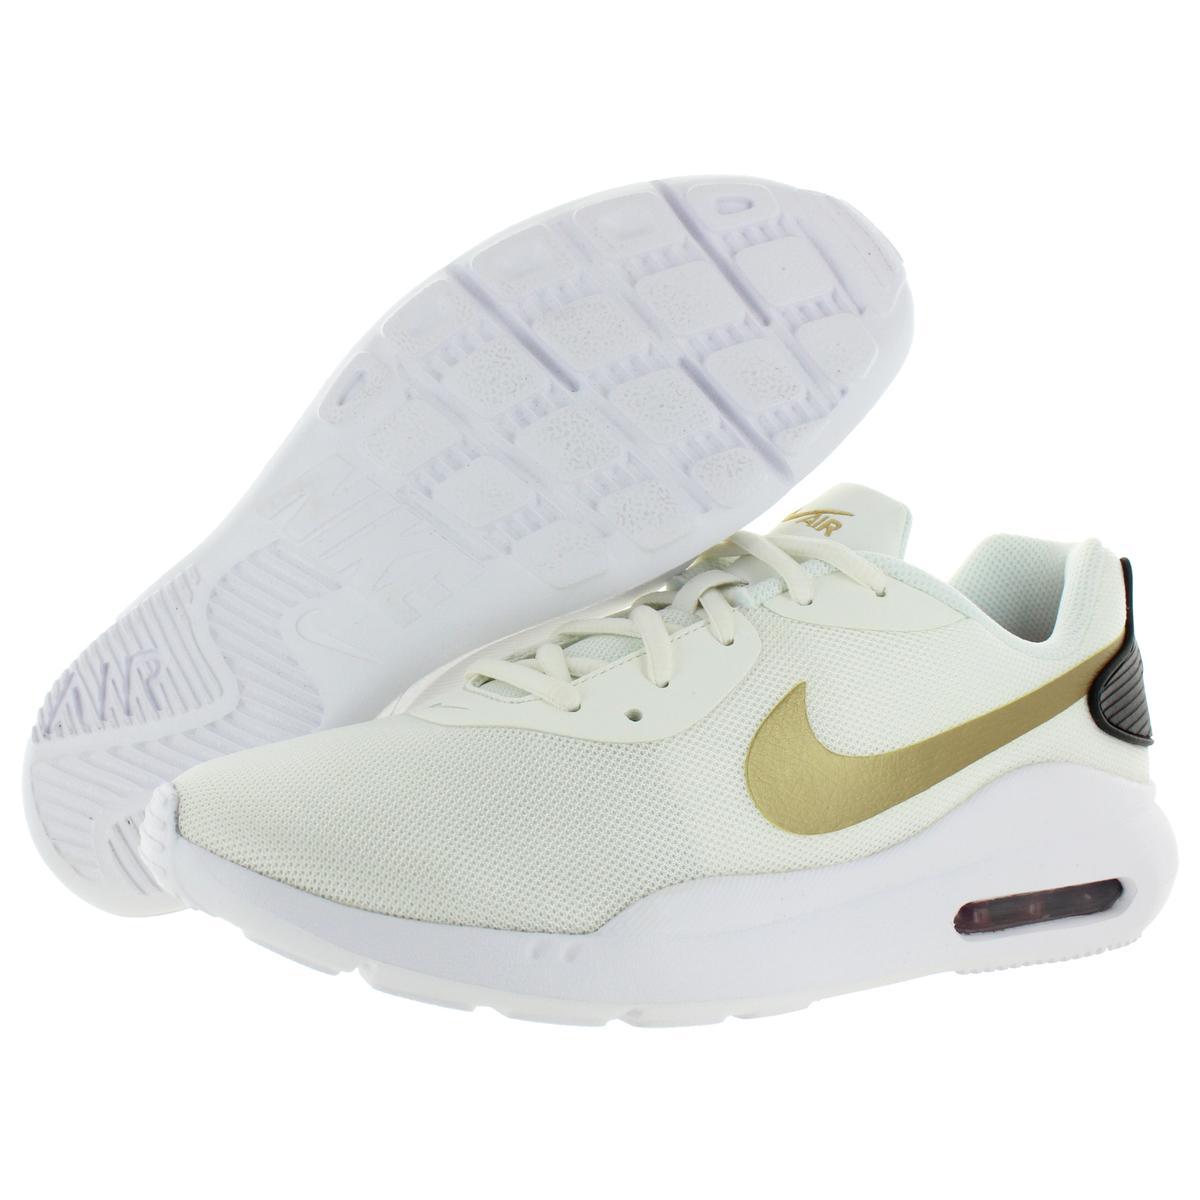 Nike-Womens-Air-Max-Oketo-Mesh-Comfort-Trainers-Running-Shoes-Sneakers-BHFO-7216 thumbnail 4